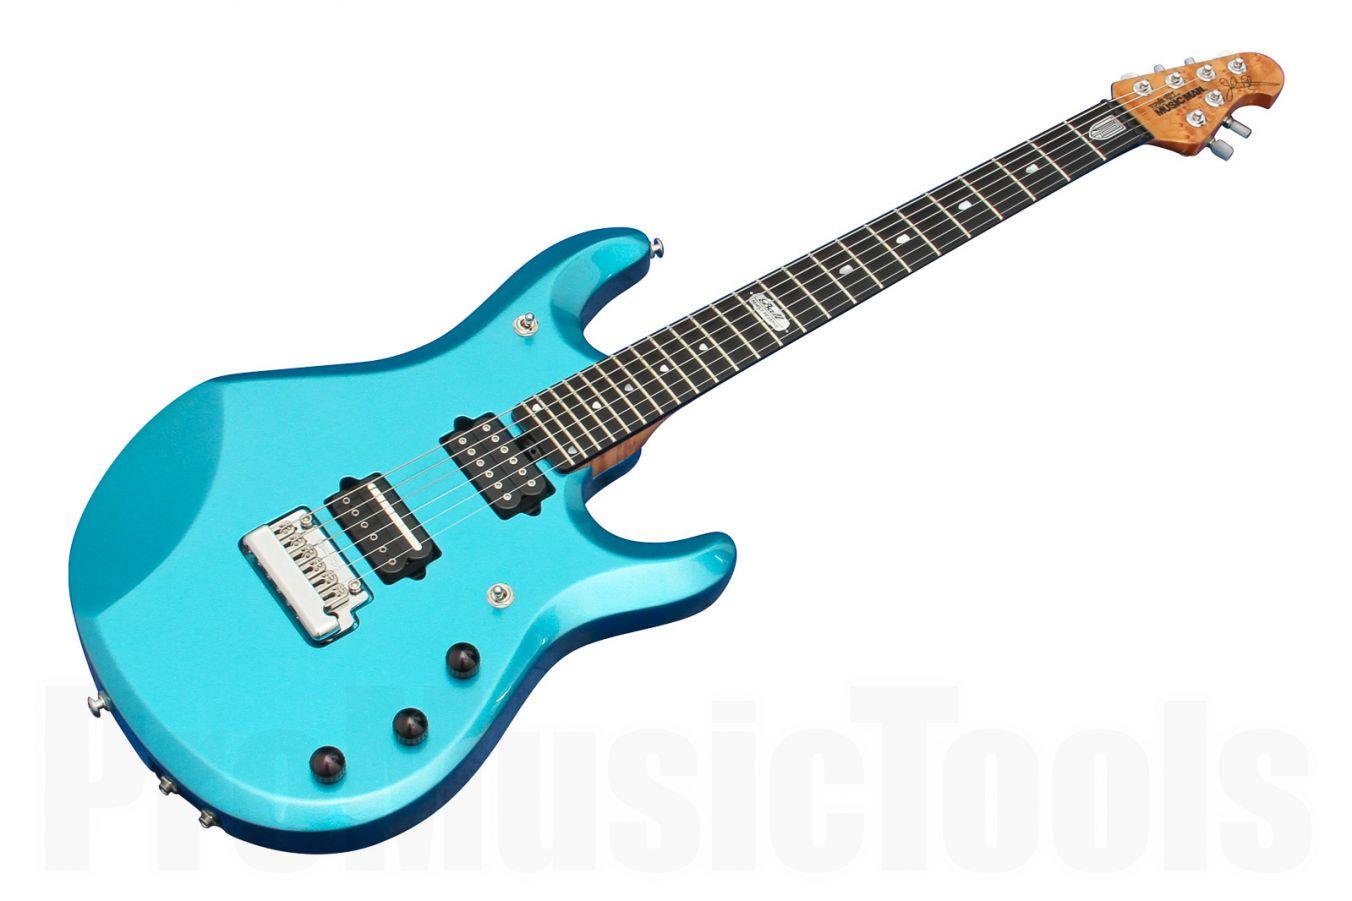 Music Man USA John Petrucci JP6 Piezo LE - BFR Aquamarine Pearl Roasted Neck Limited Edition